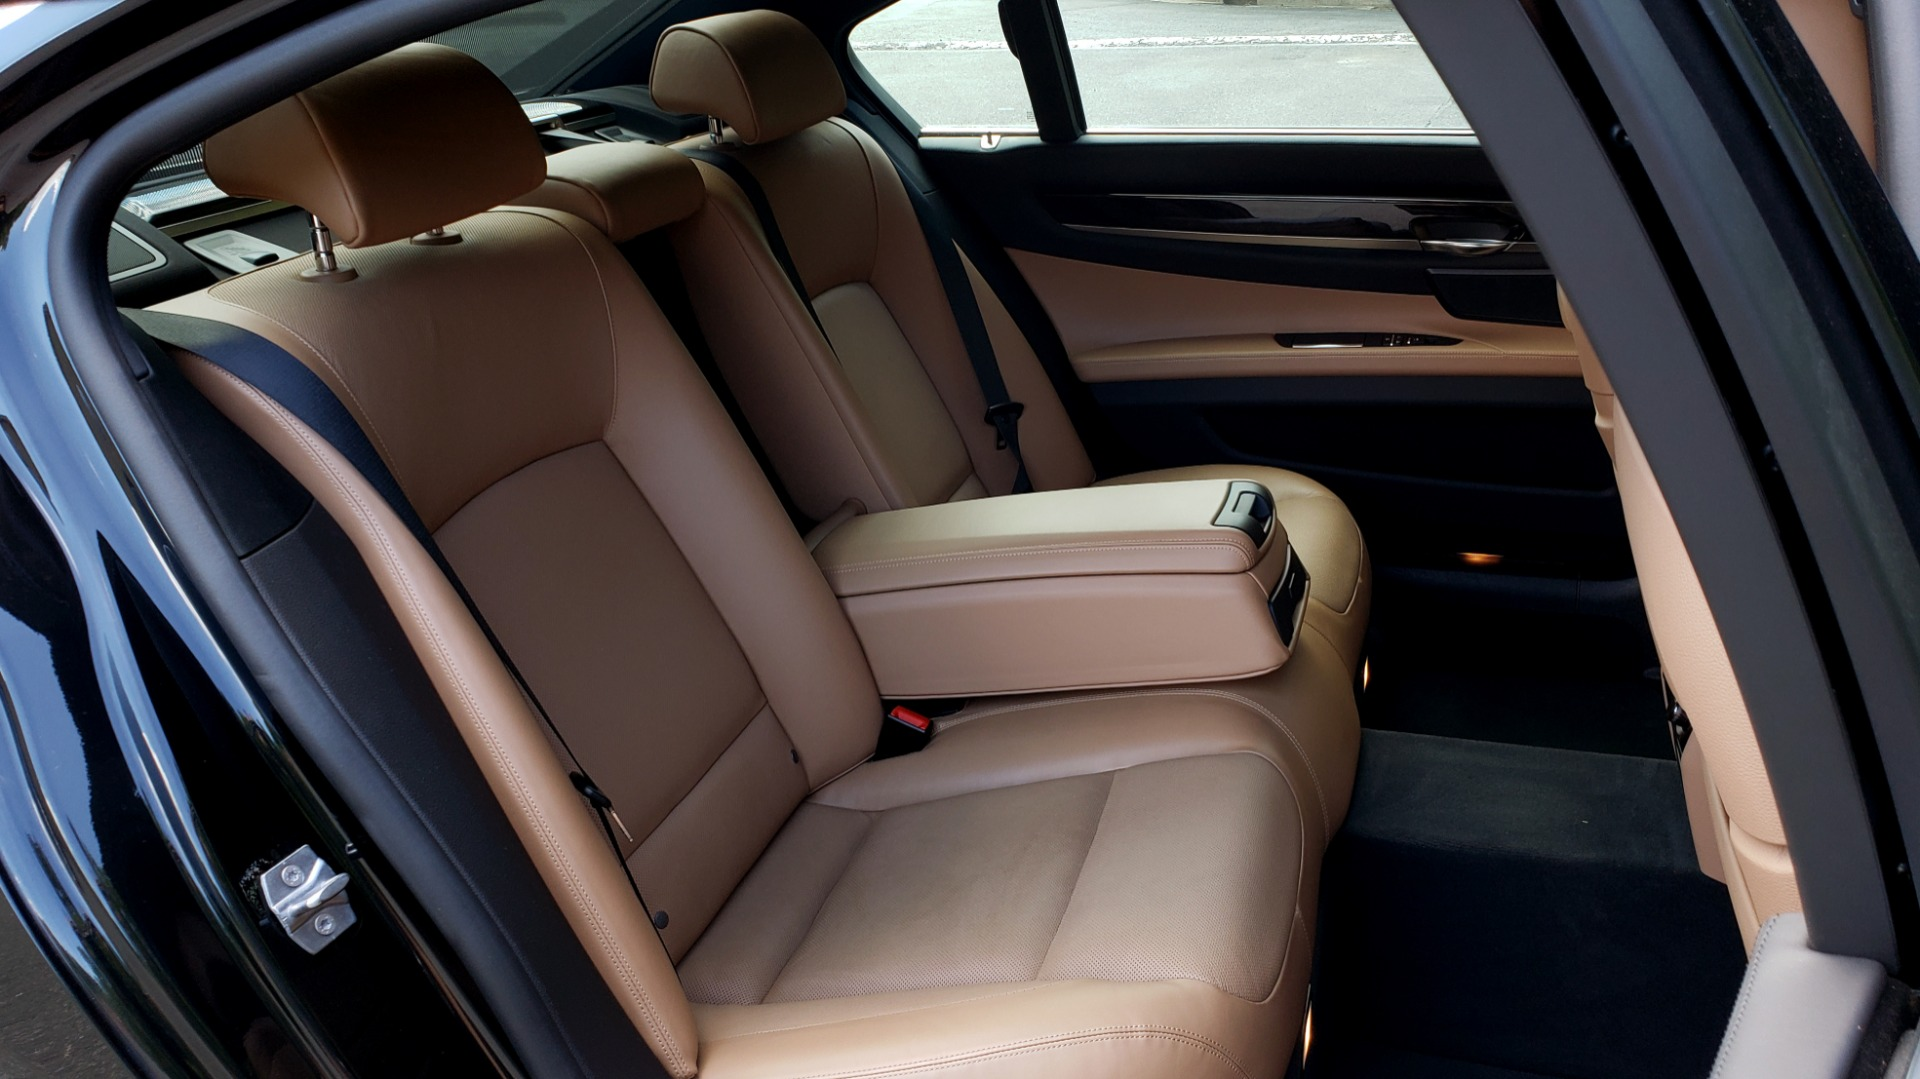 Used 2014 BMW 7 SERIES 750LI M-SPORT / EXEC PKG / DRVR ASST / LIGHTING / NAV / SUNROOF for sale Sold at Formula Imports in Charlotte NC 28227 71